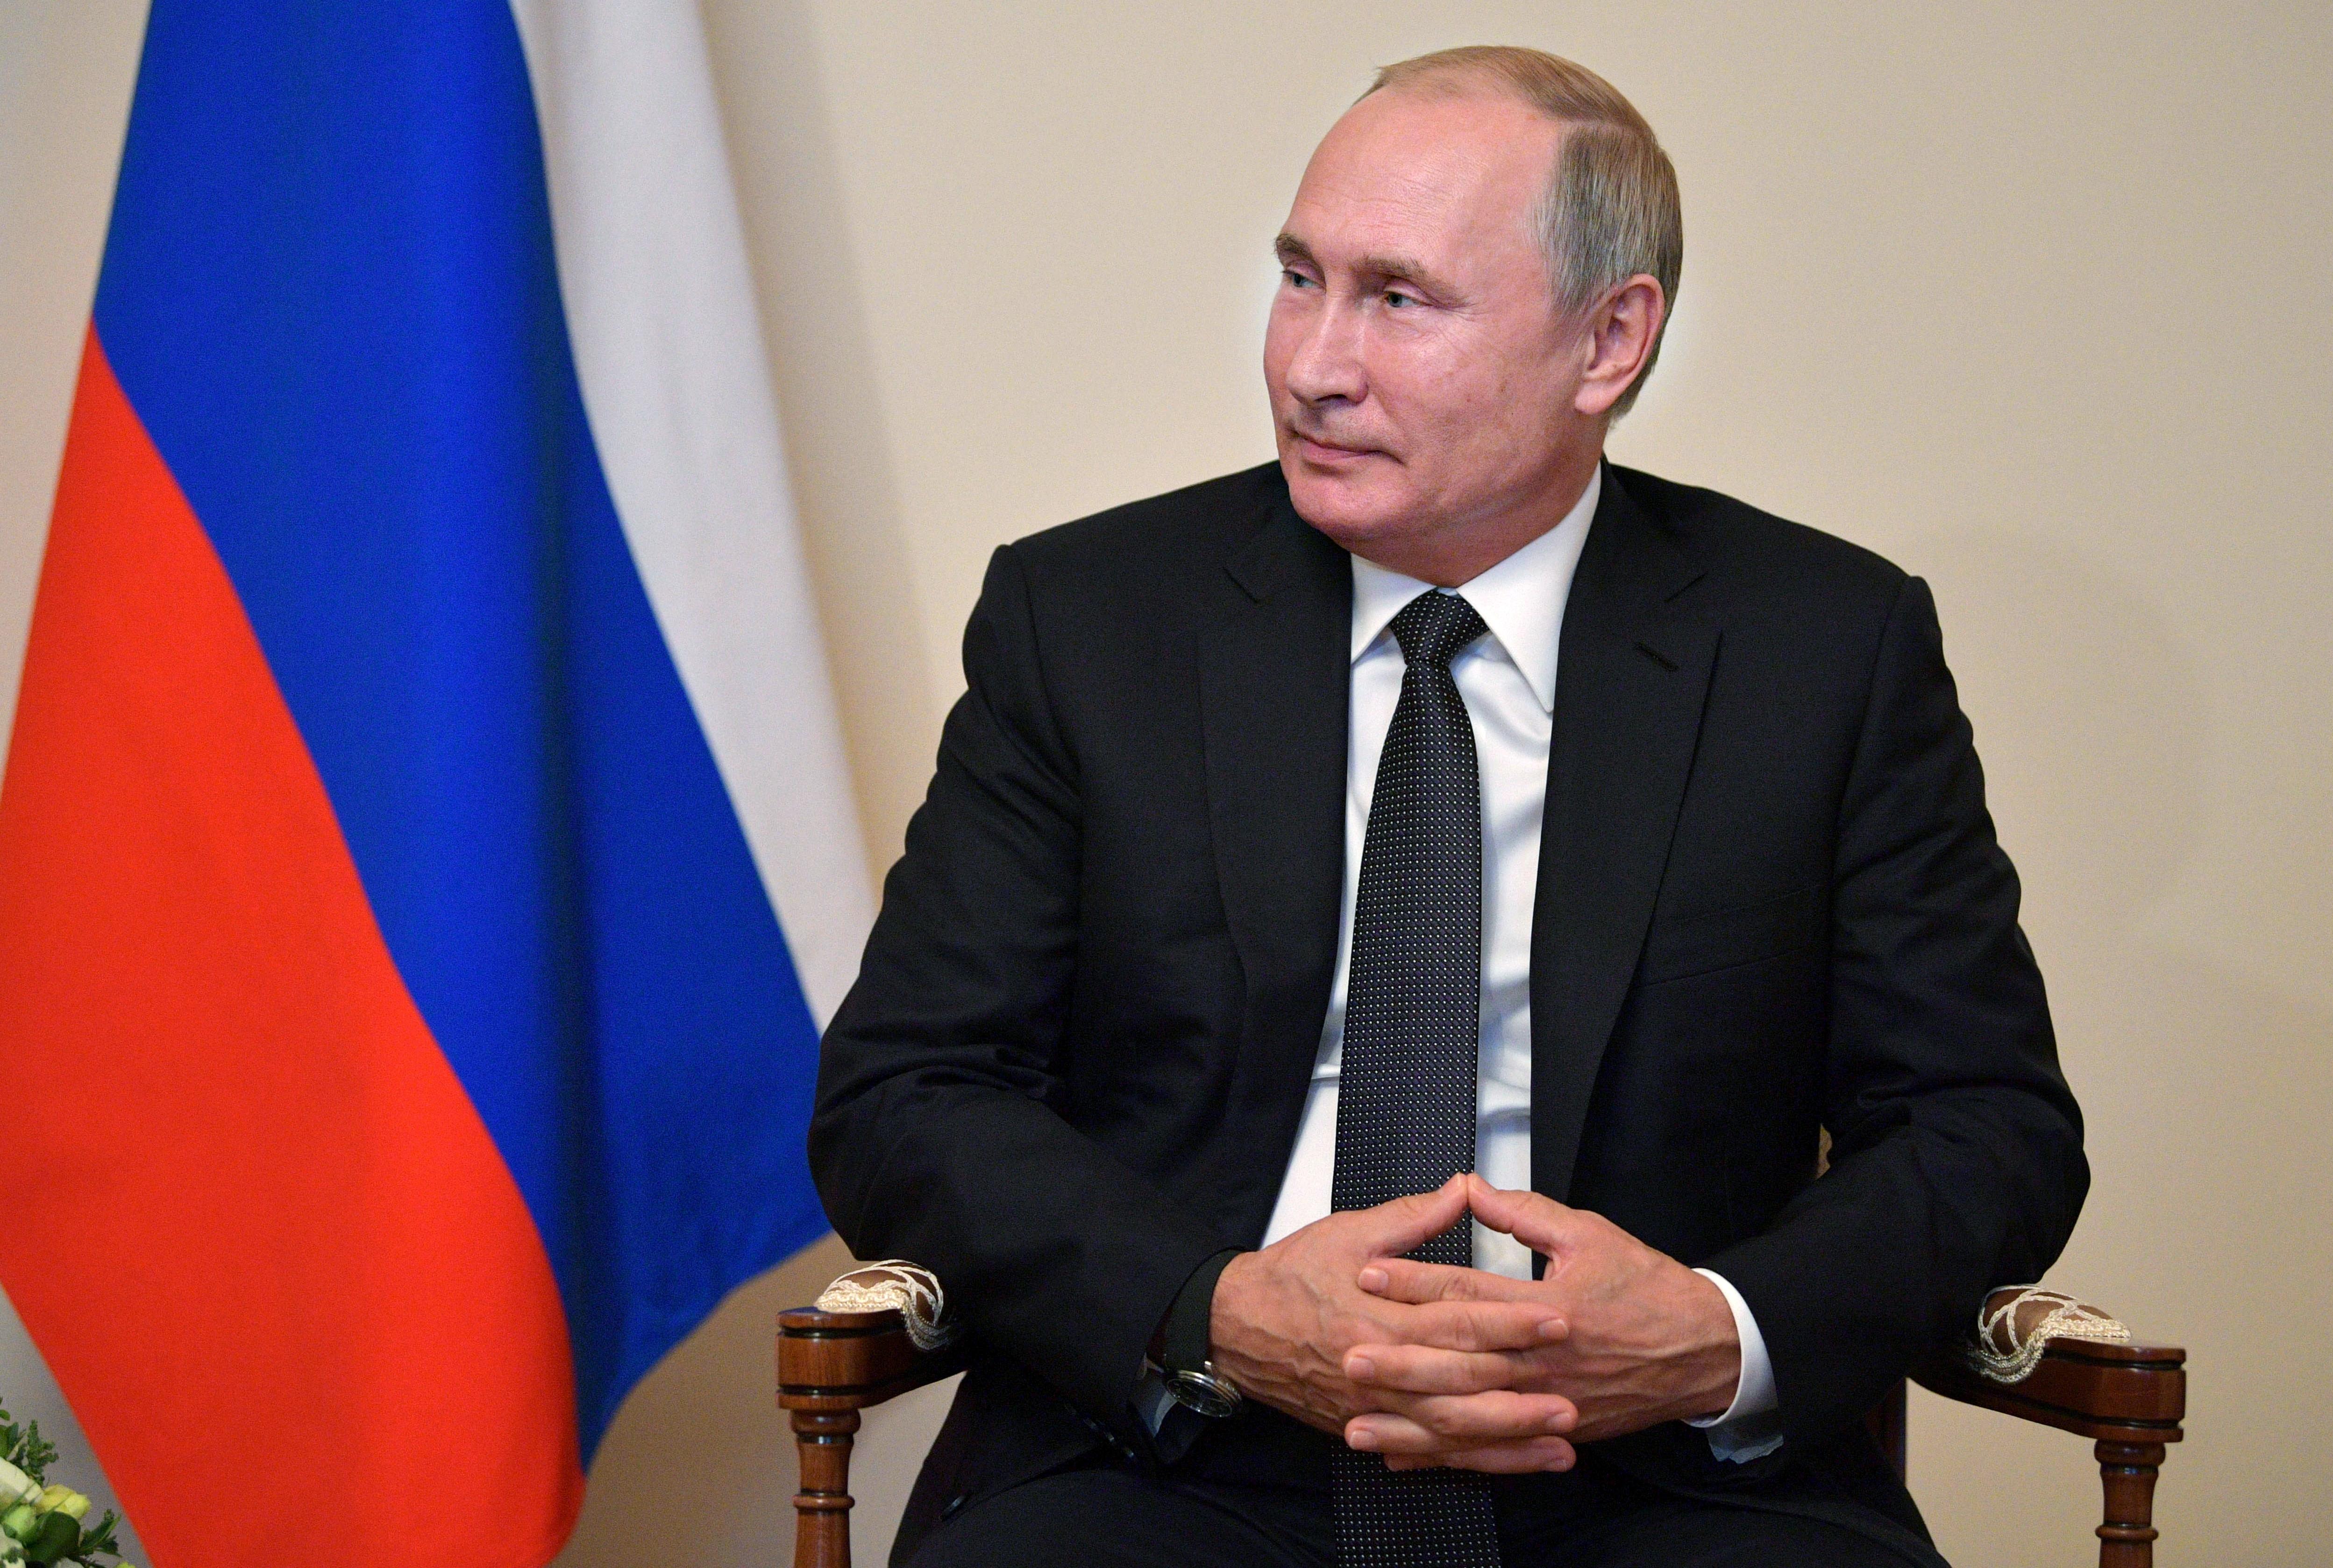 Russia's Putin criticises Greta Thunberg's UN speech